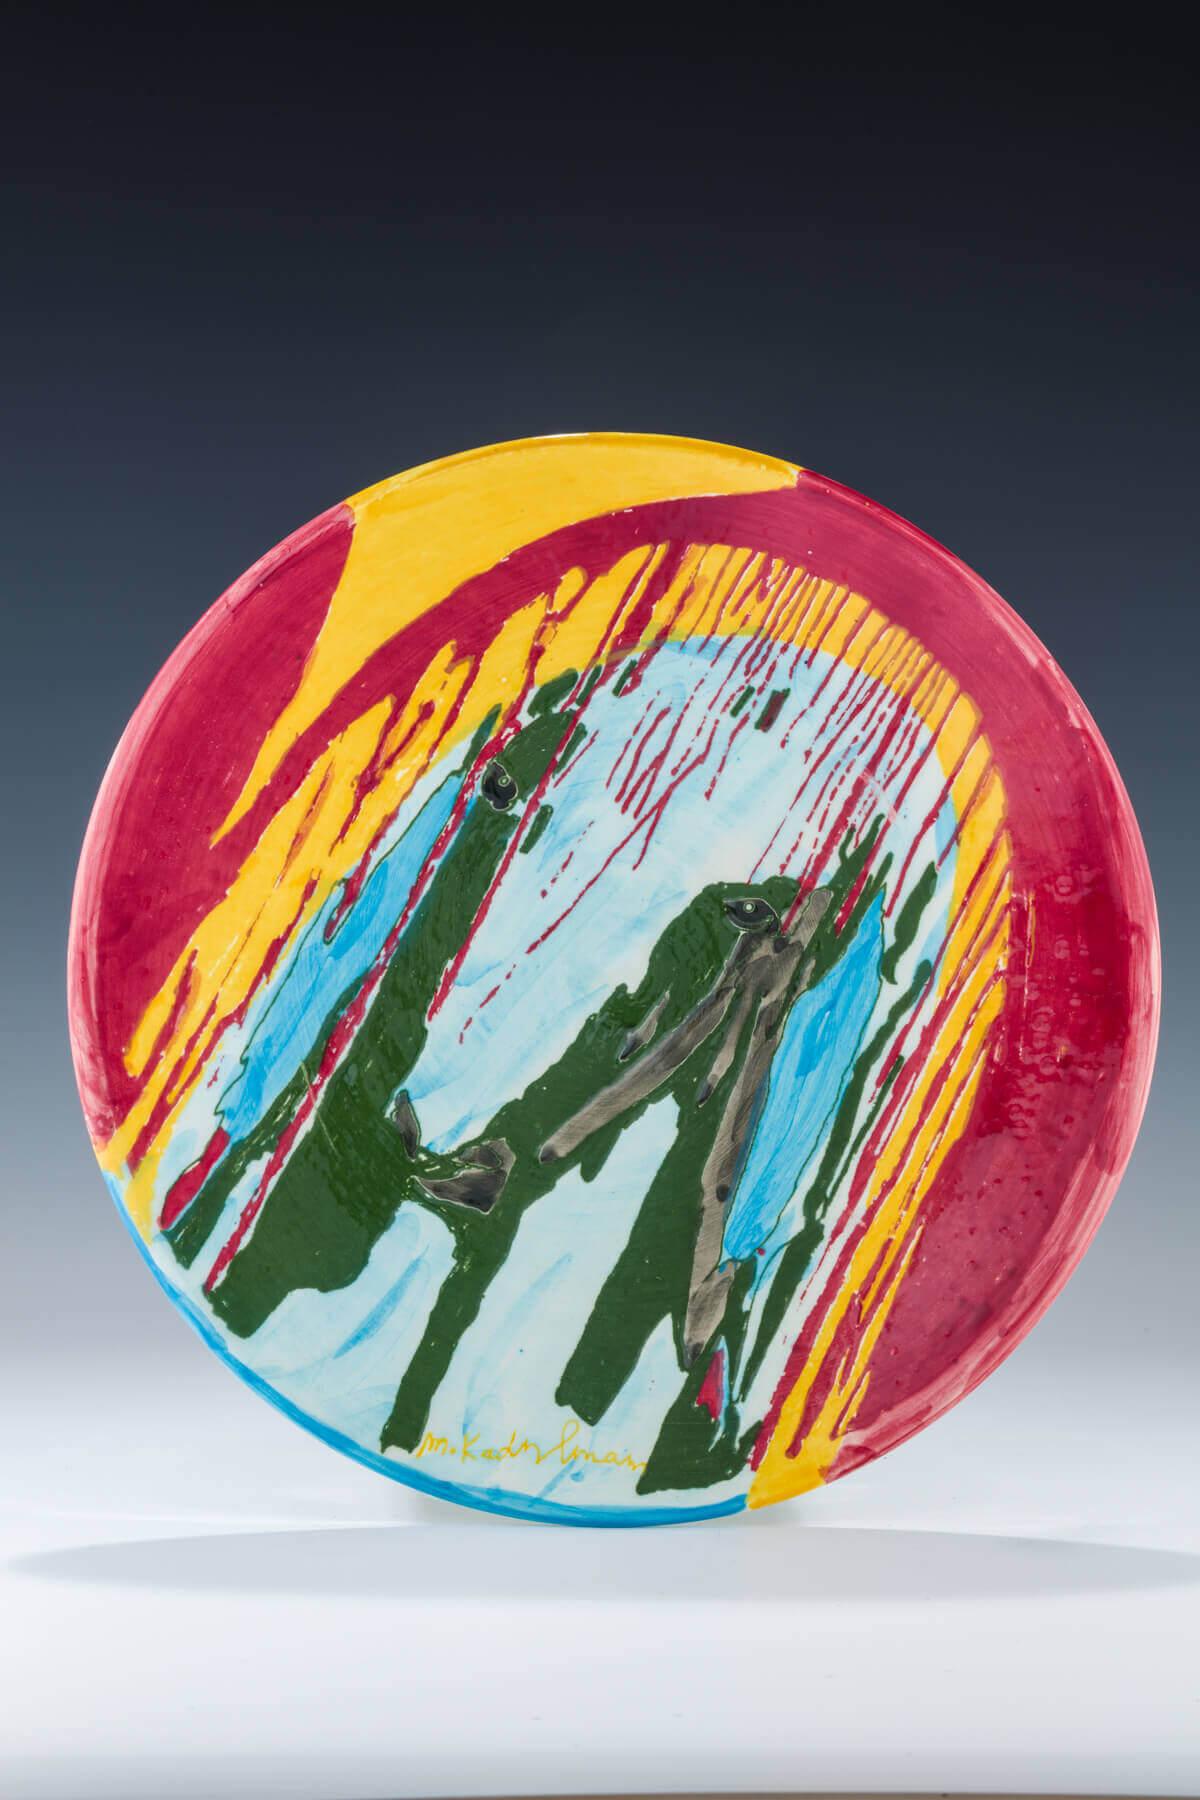 173. A CERAMIC PLATE BY MENASHE KADISHMAN